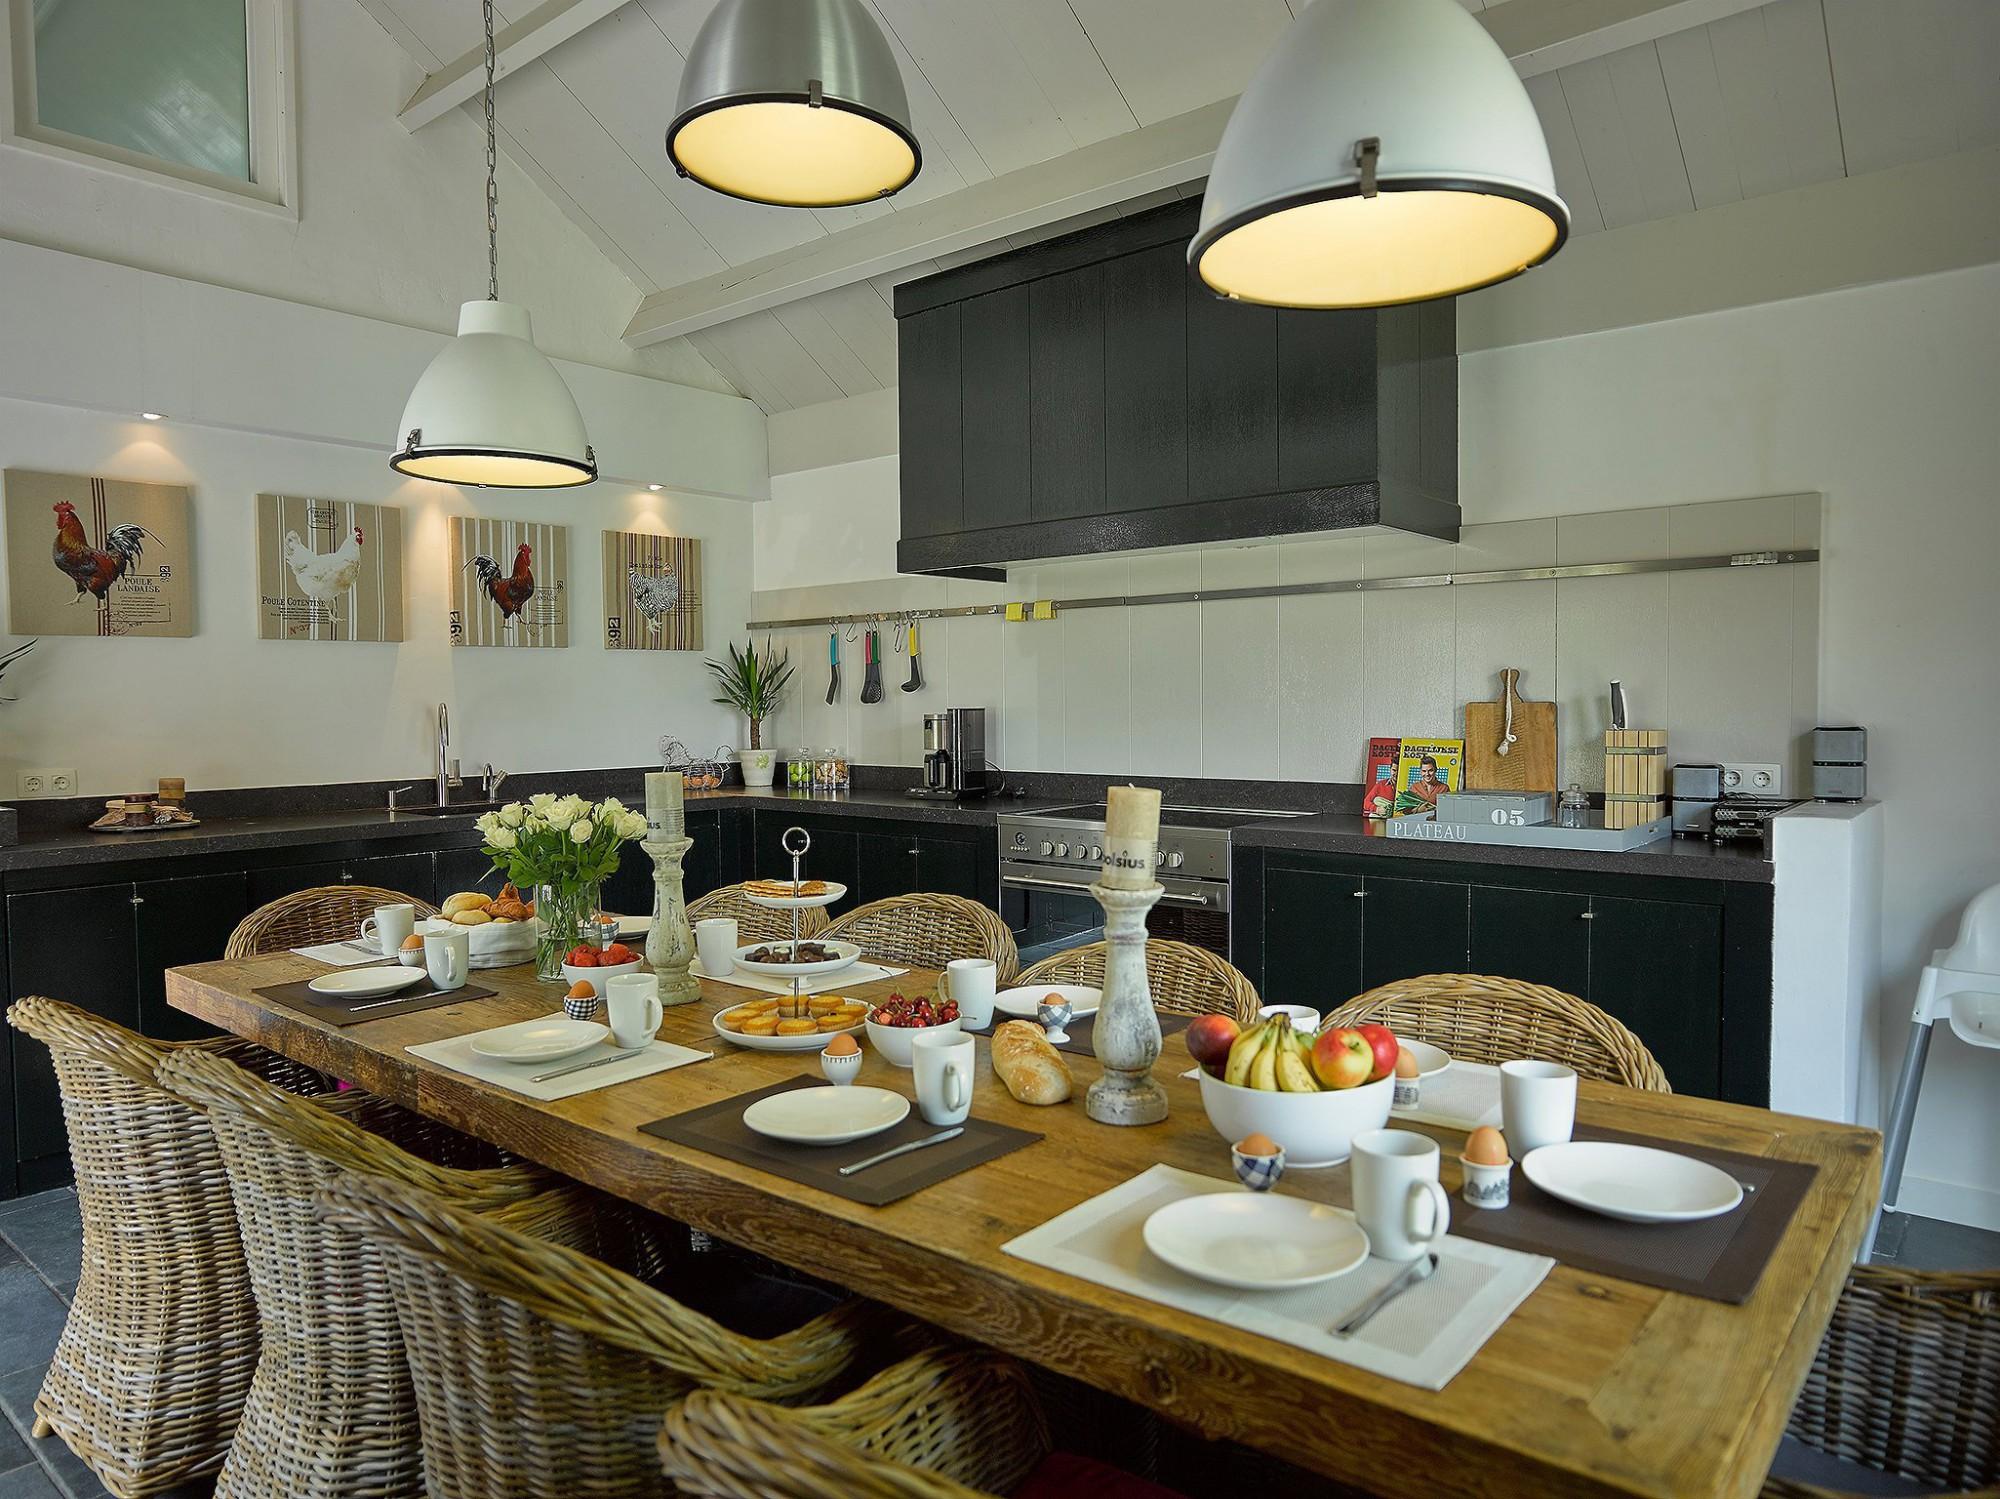 Afbeelding: Fotografie interieur keuken vakantiewoning